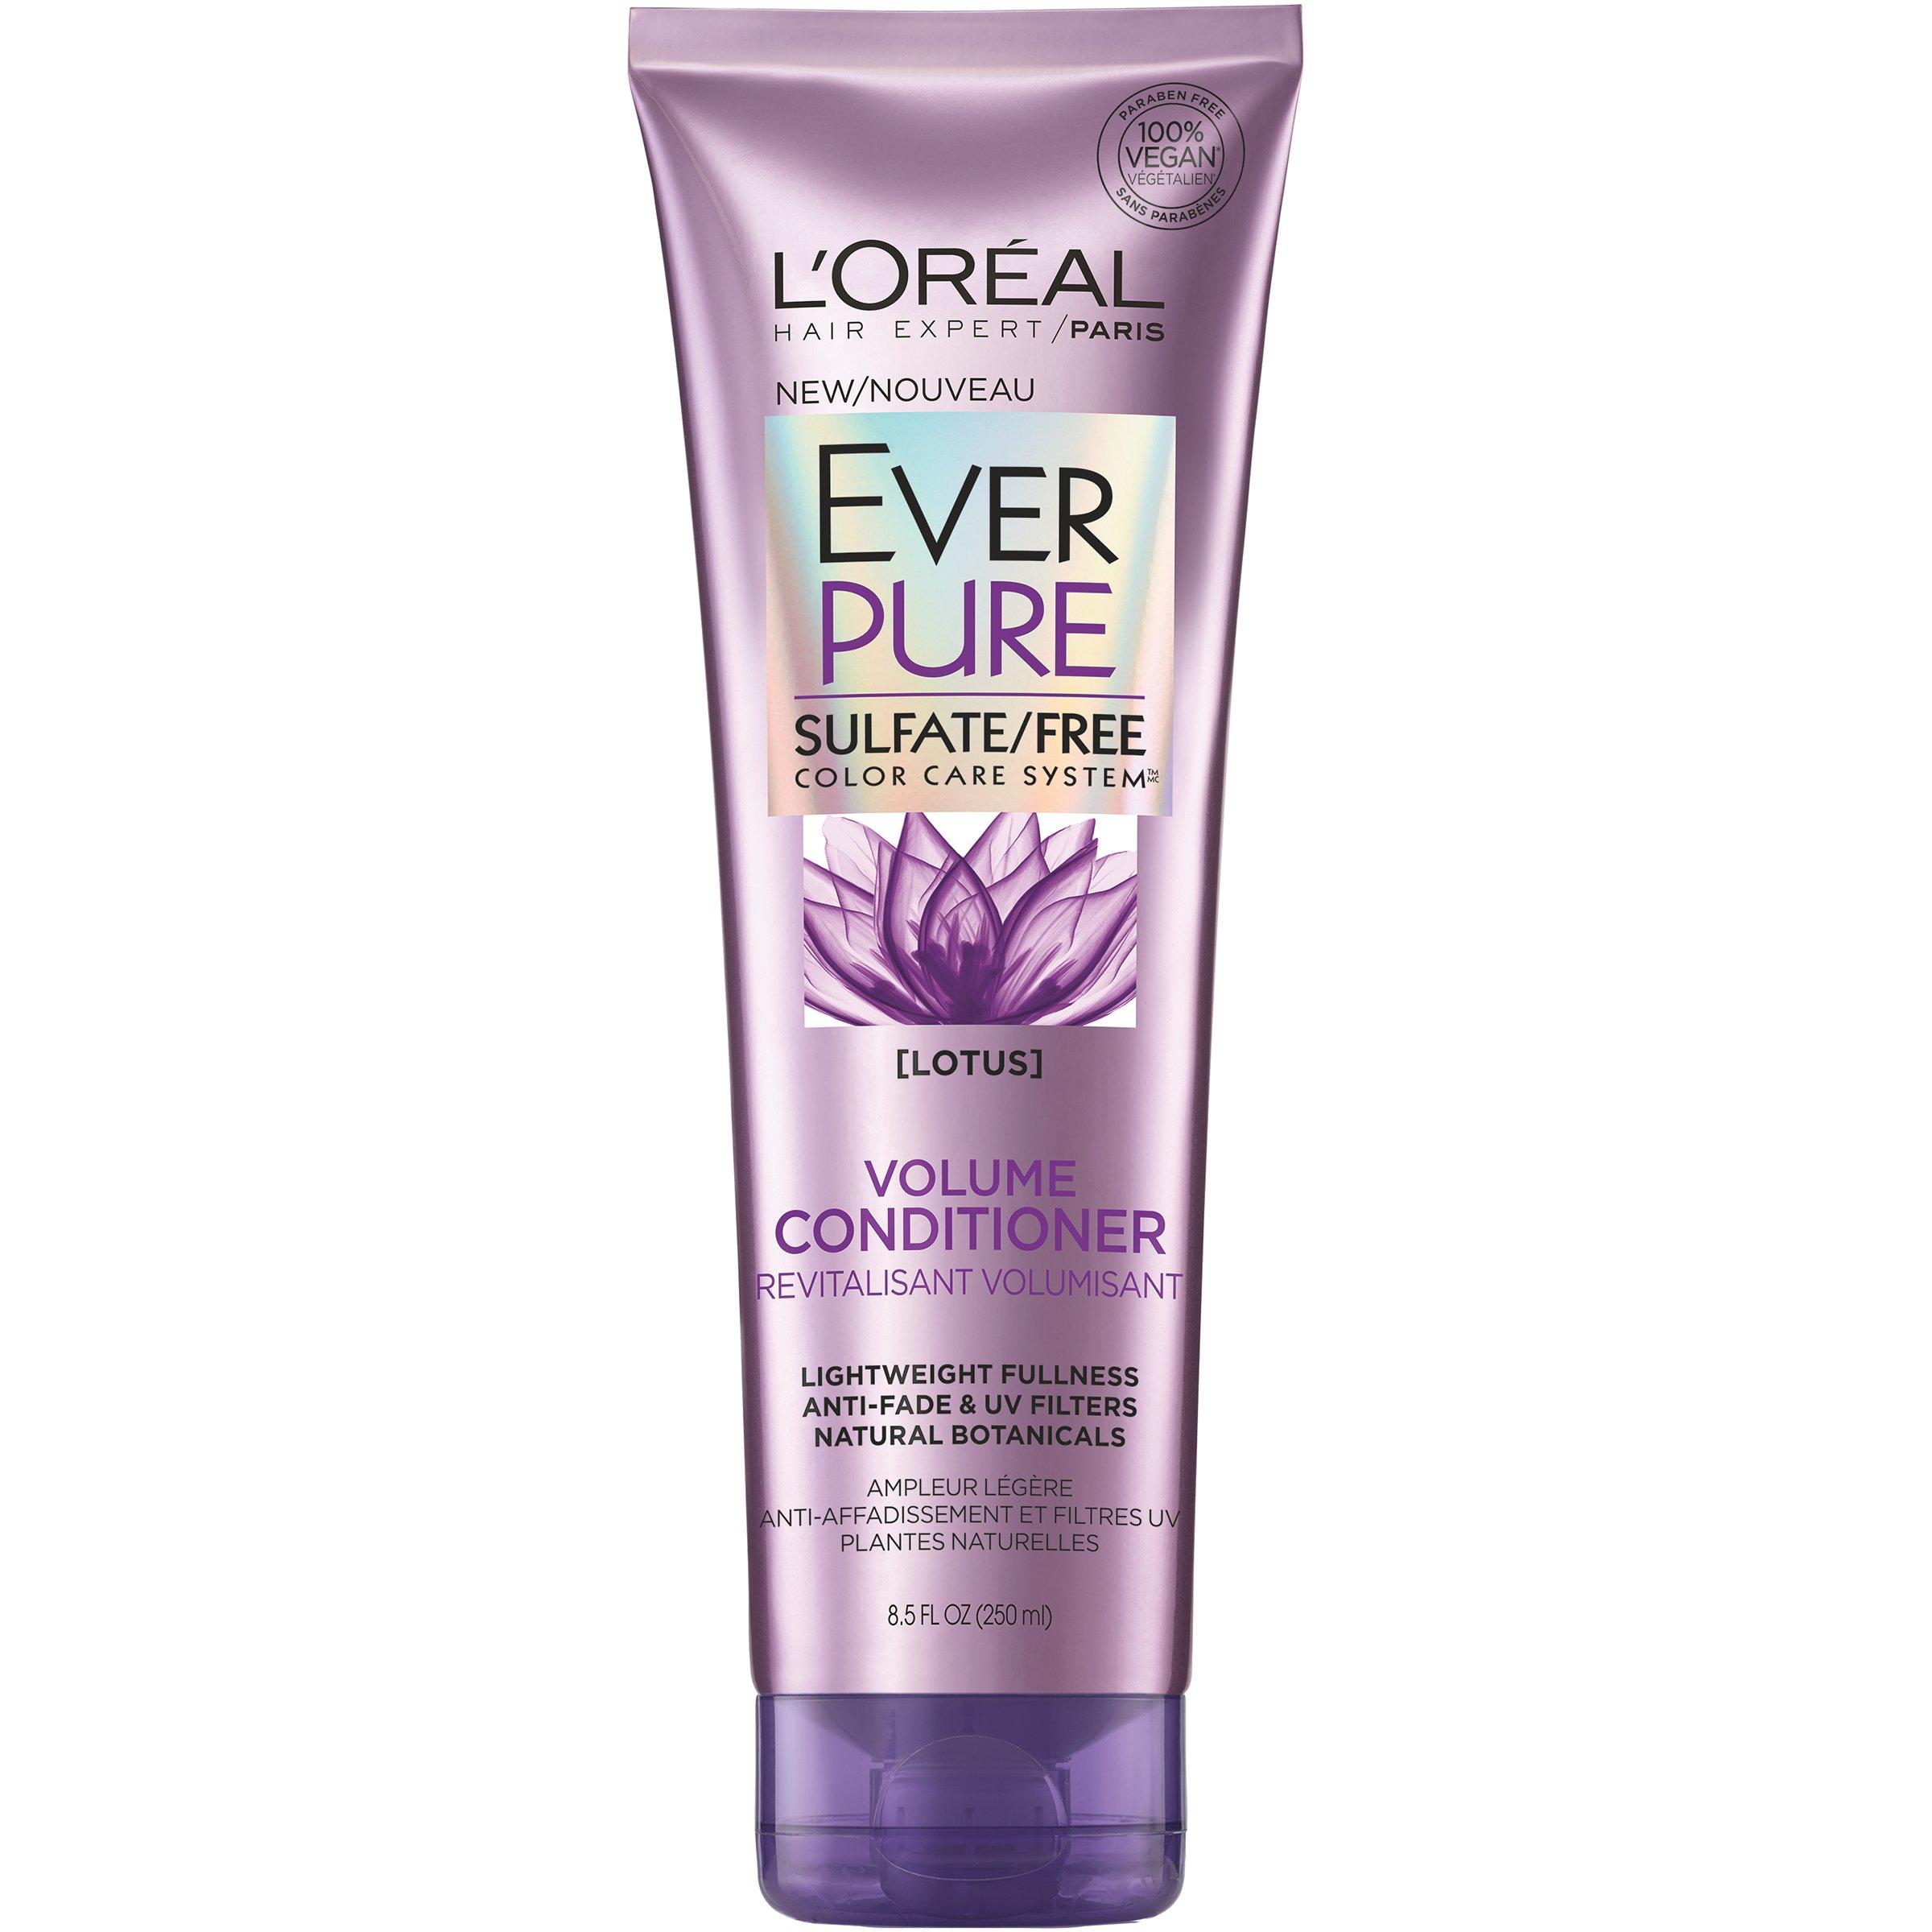 L'Oréal Paris EverPure Sulfate Free Volume Conditioner, 8.5 fl. oz.